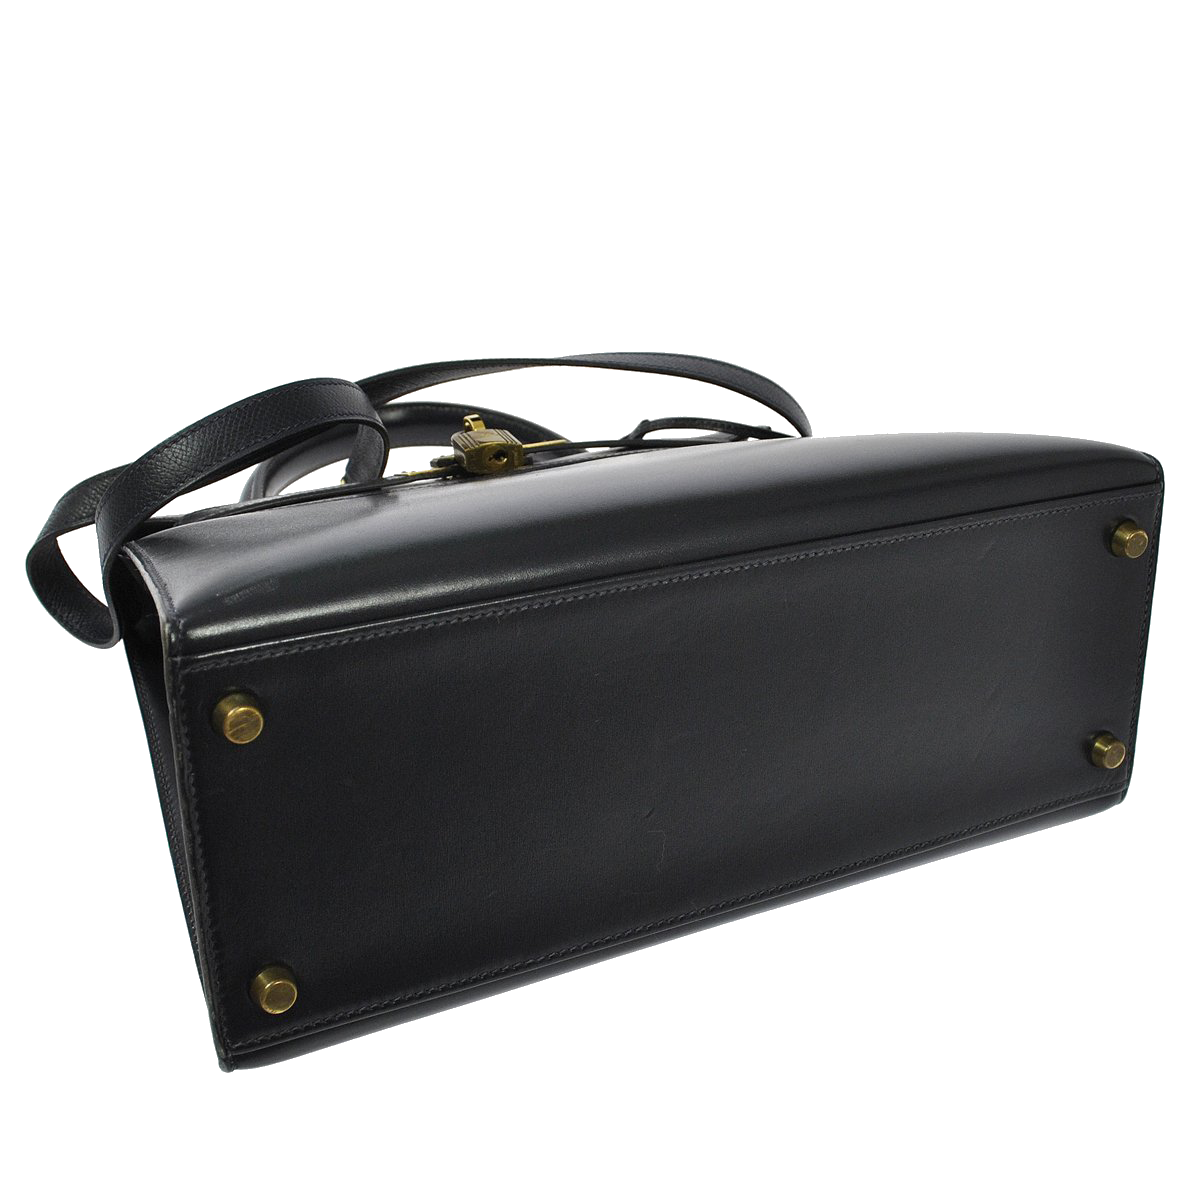 Hermès Kelly 28 Sellier Box Black